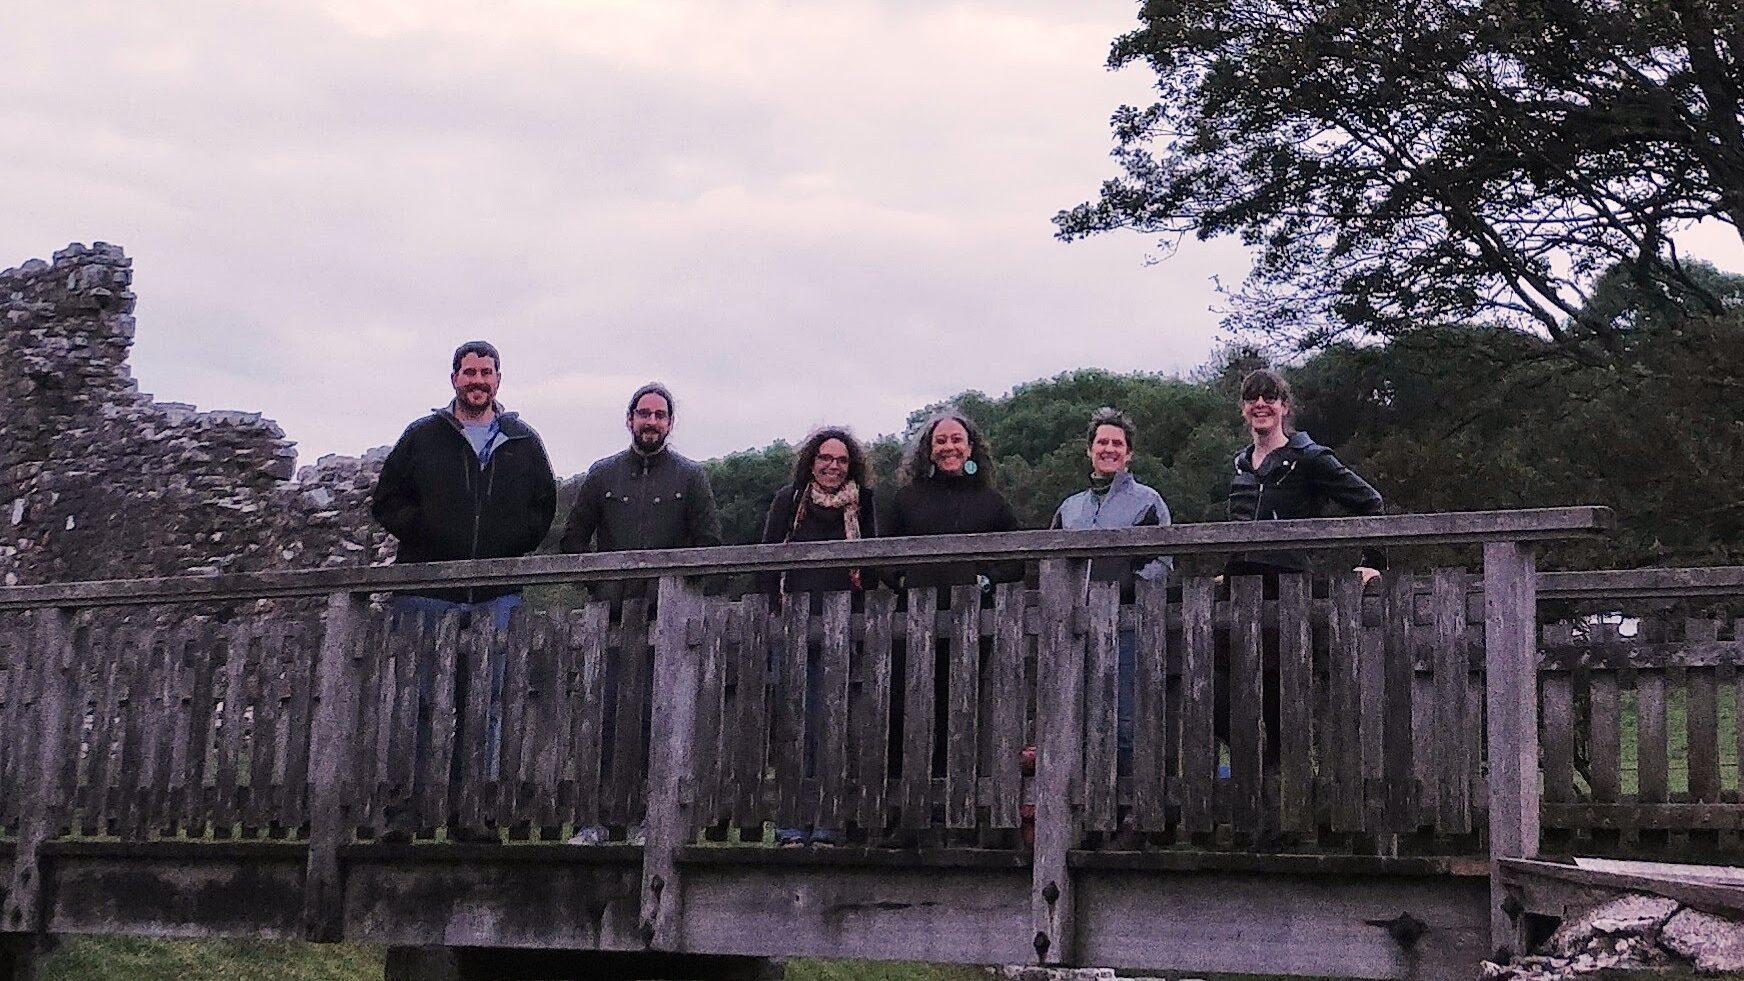 TGRAISN project team photo 2019